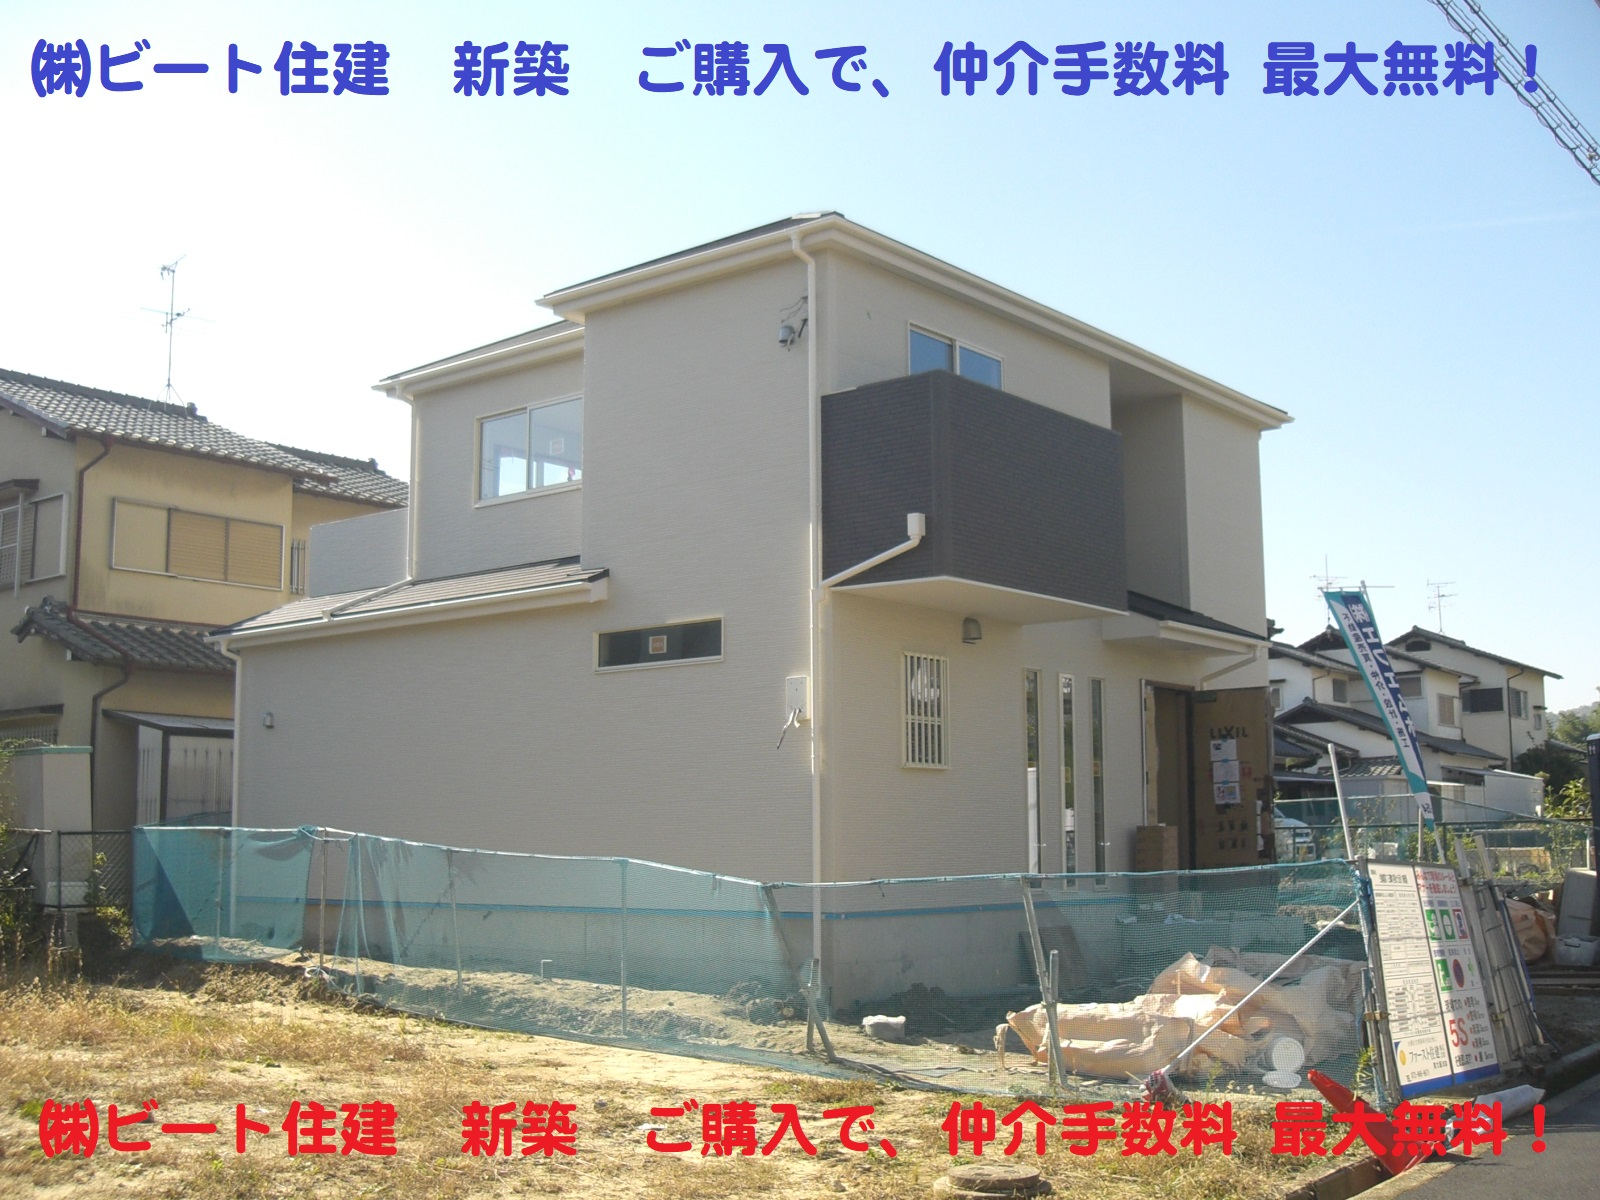 奈良県 三郷町 美松ヶ丘西 新築住宅 ビート住建 仲介手数料無料です!